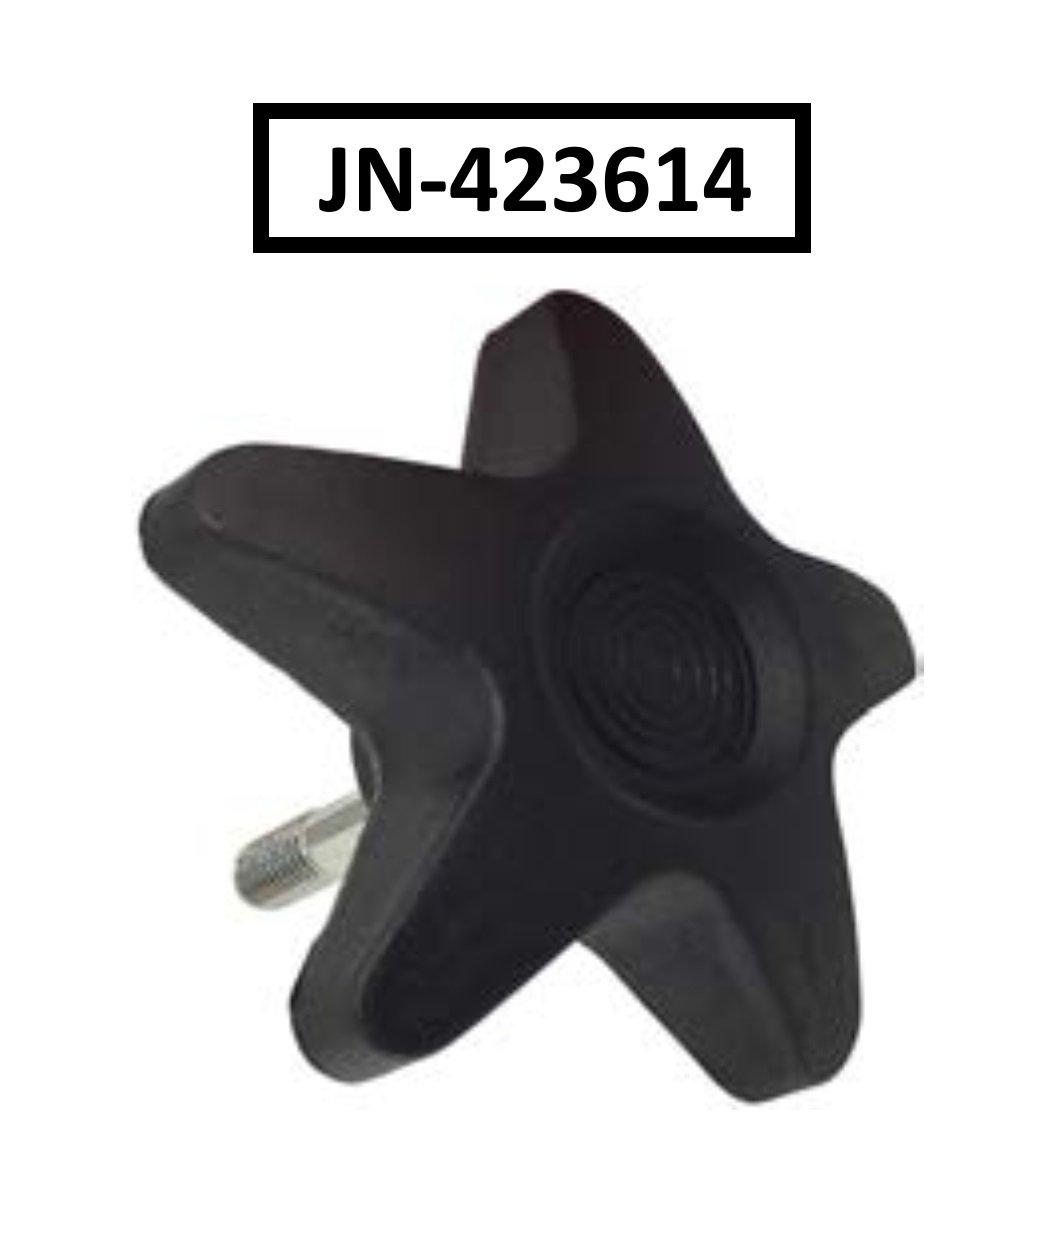 Nova Replacement Parts for Vibe ROLLING WALKER with Serial Number JN - SPRING FOR BRAKE SHOE - JN-423625 Nova Medical